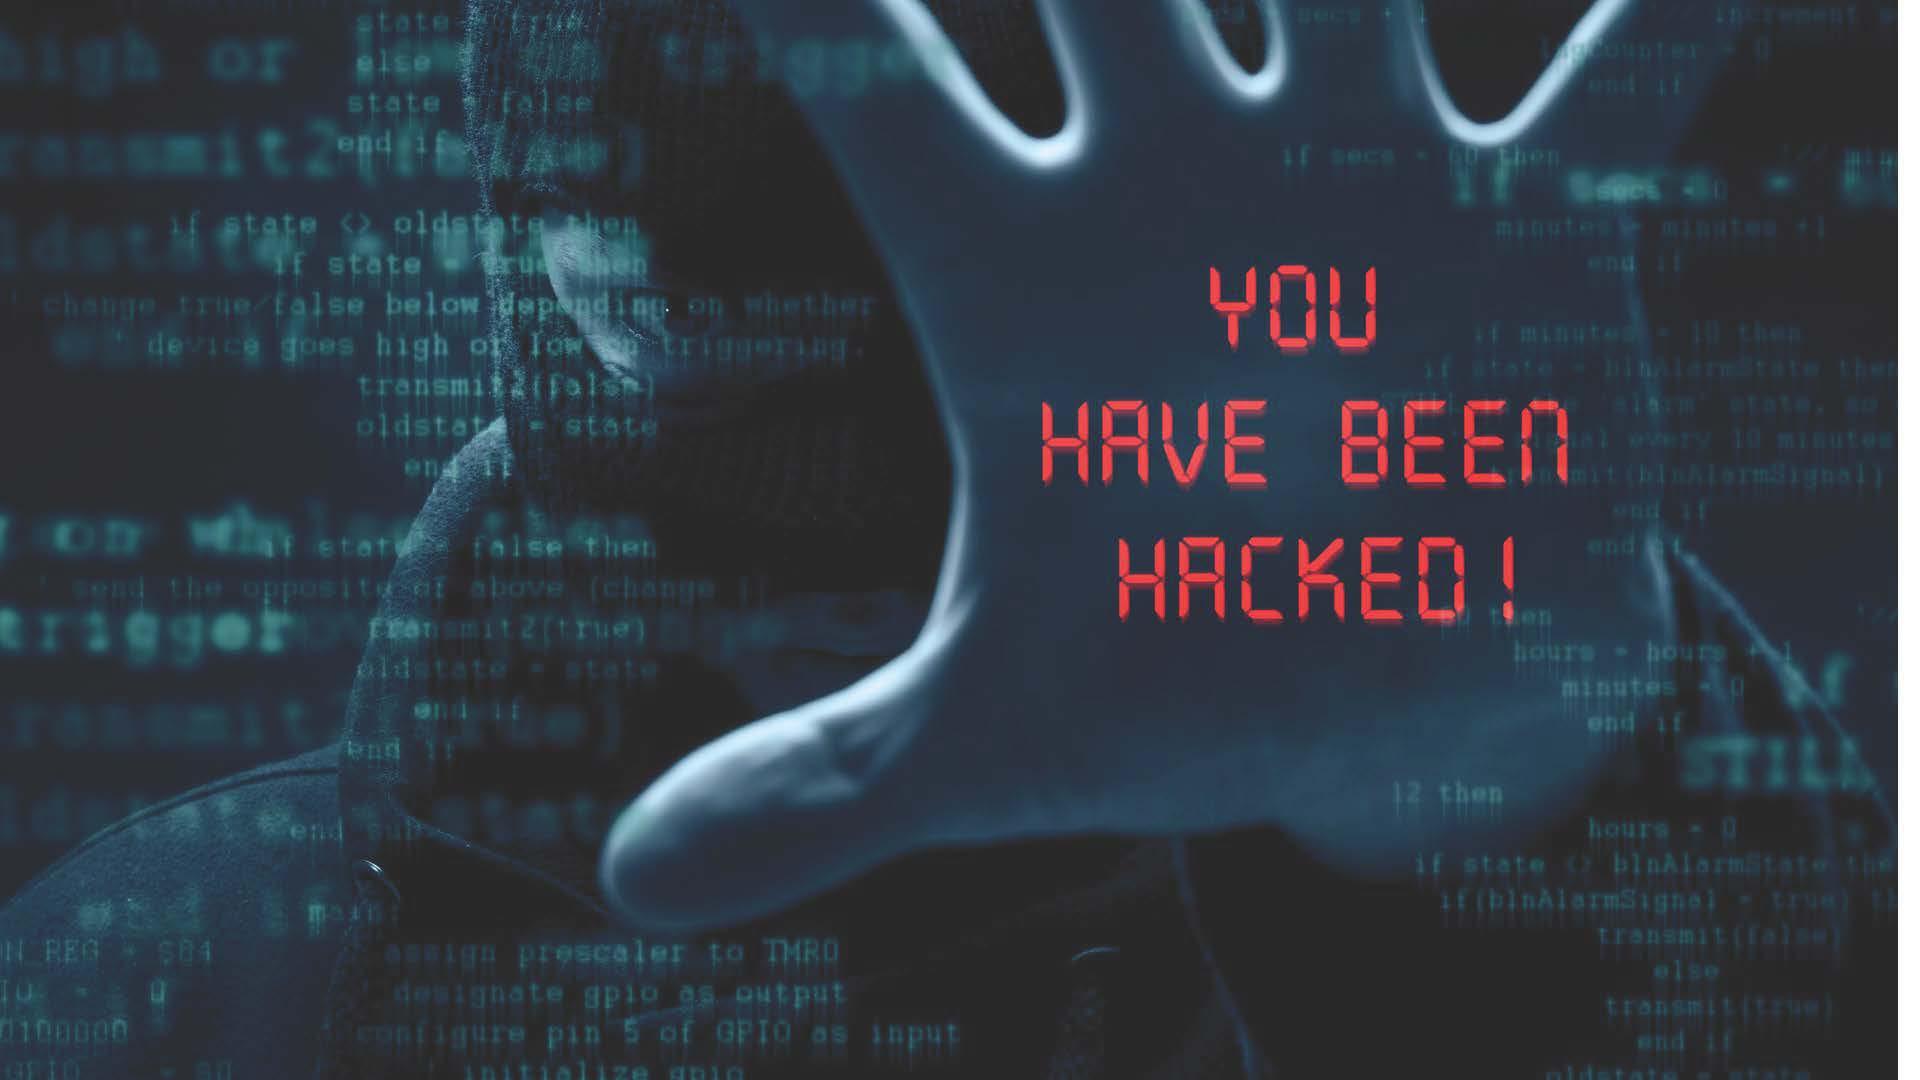 Hackerangriff Hand mit Schriftzug